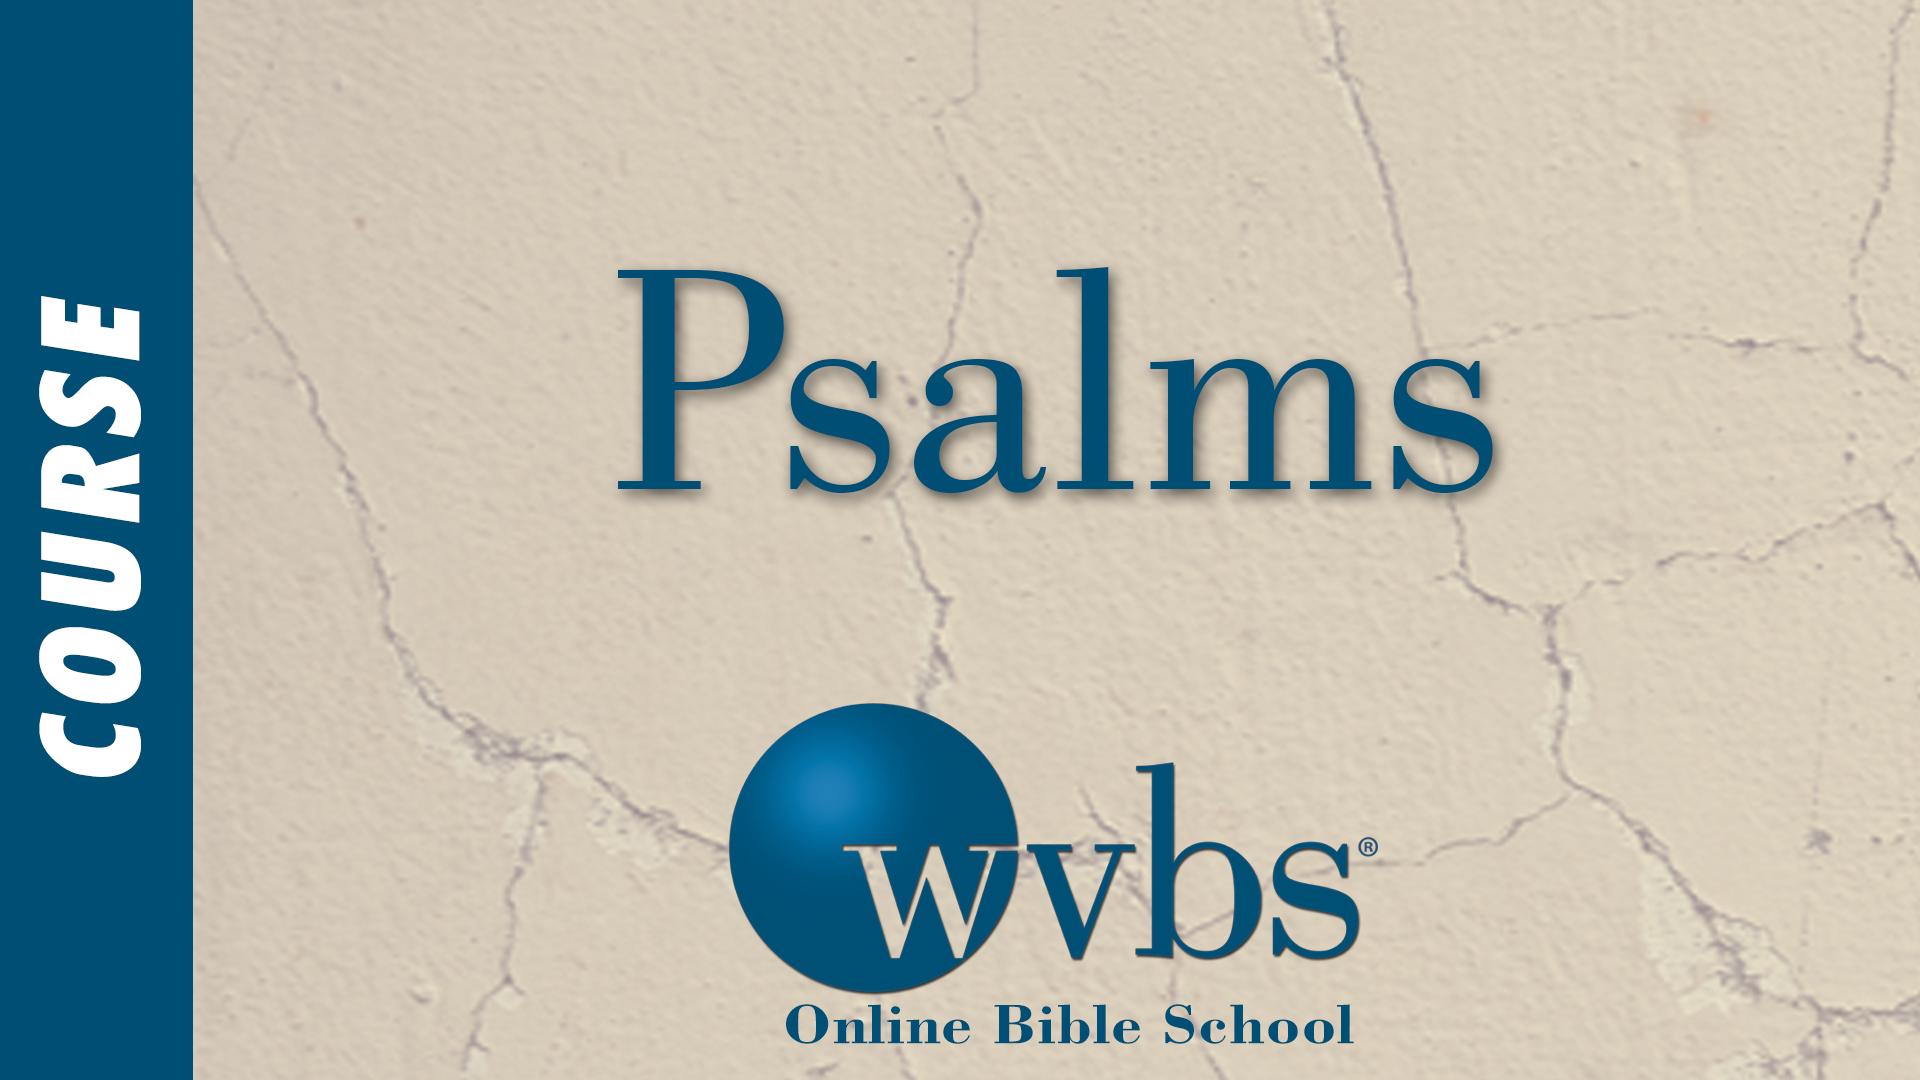 Psalms (Online Bible School)